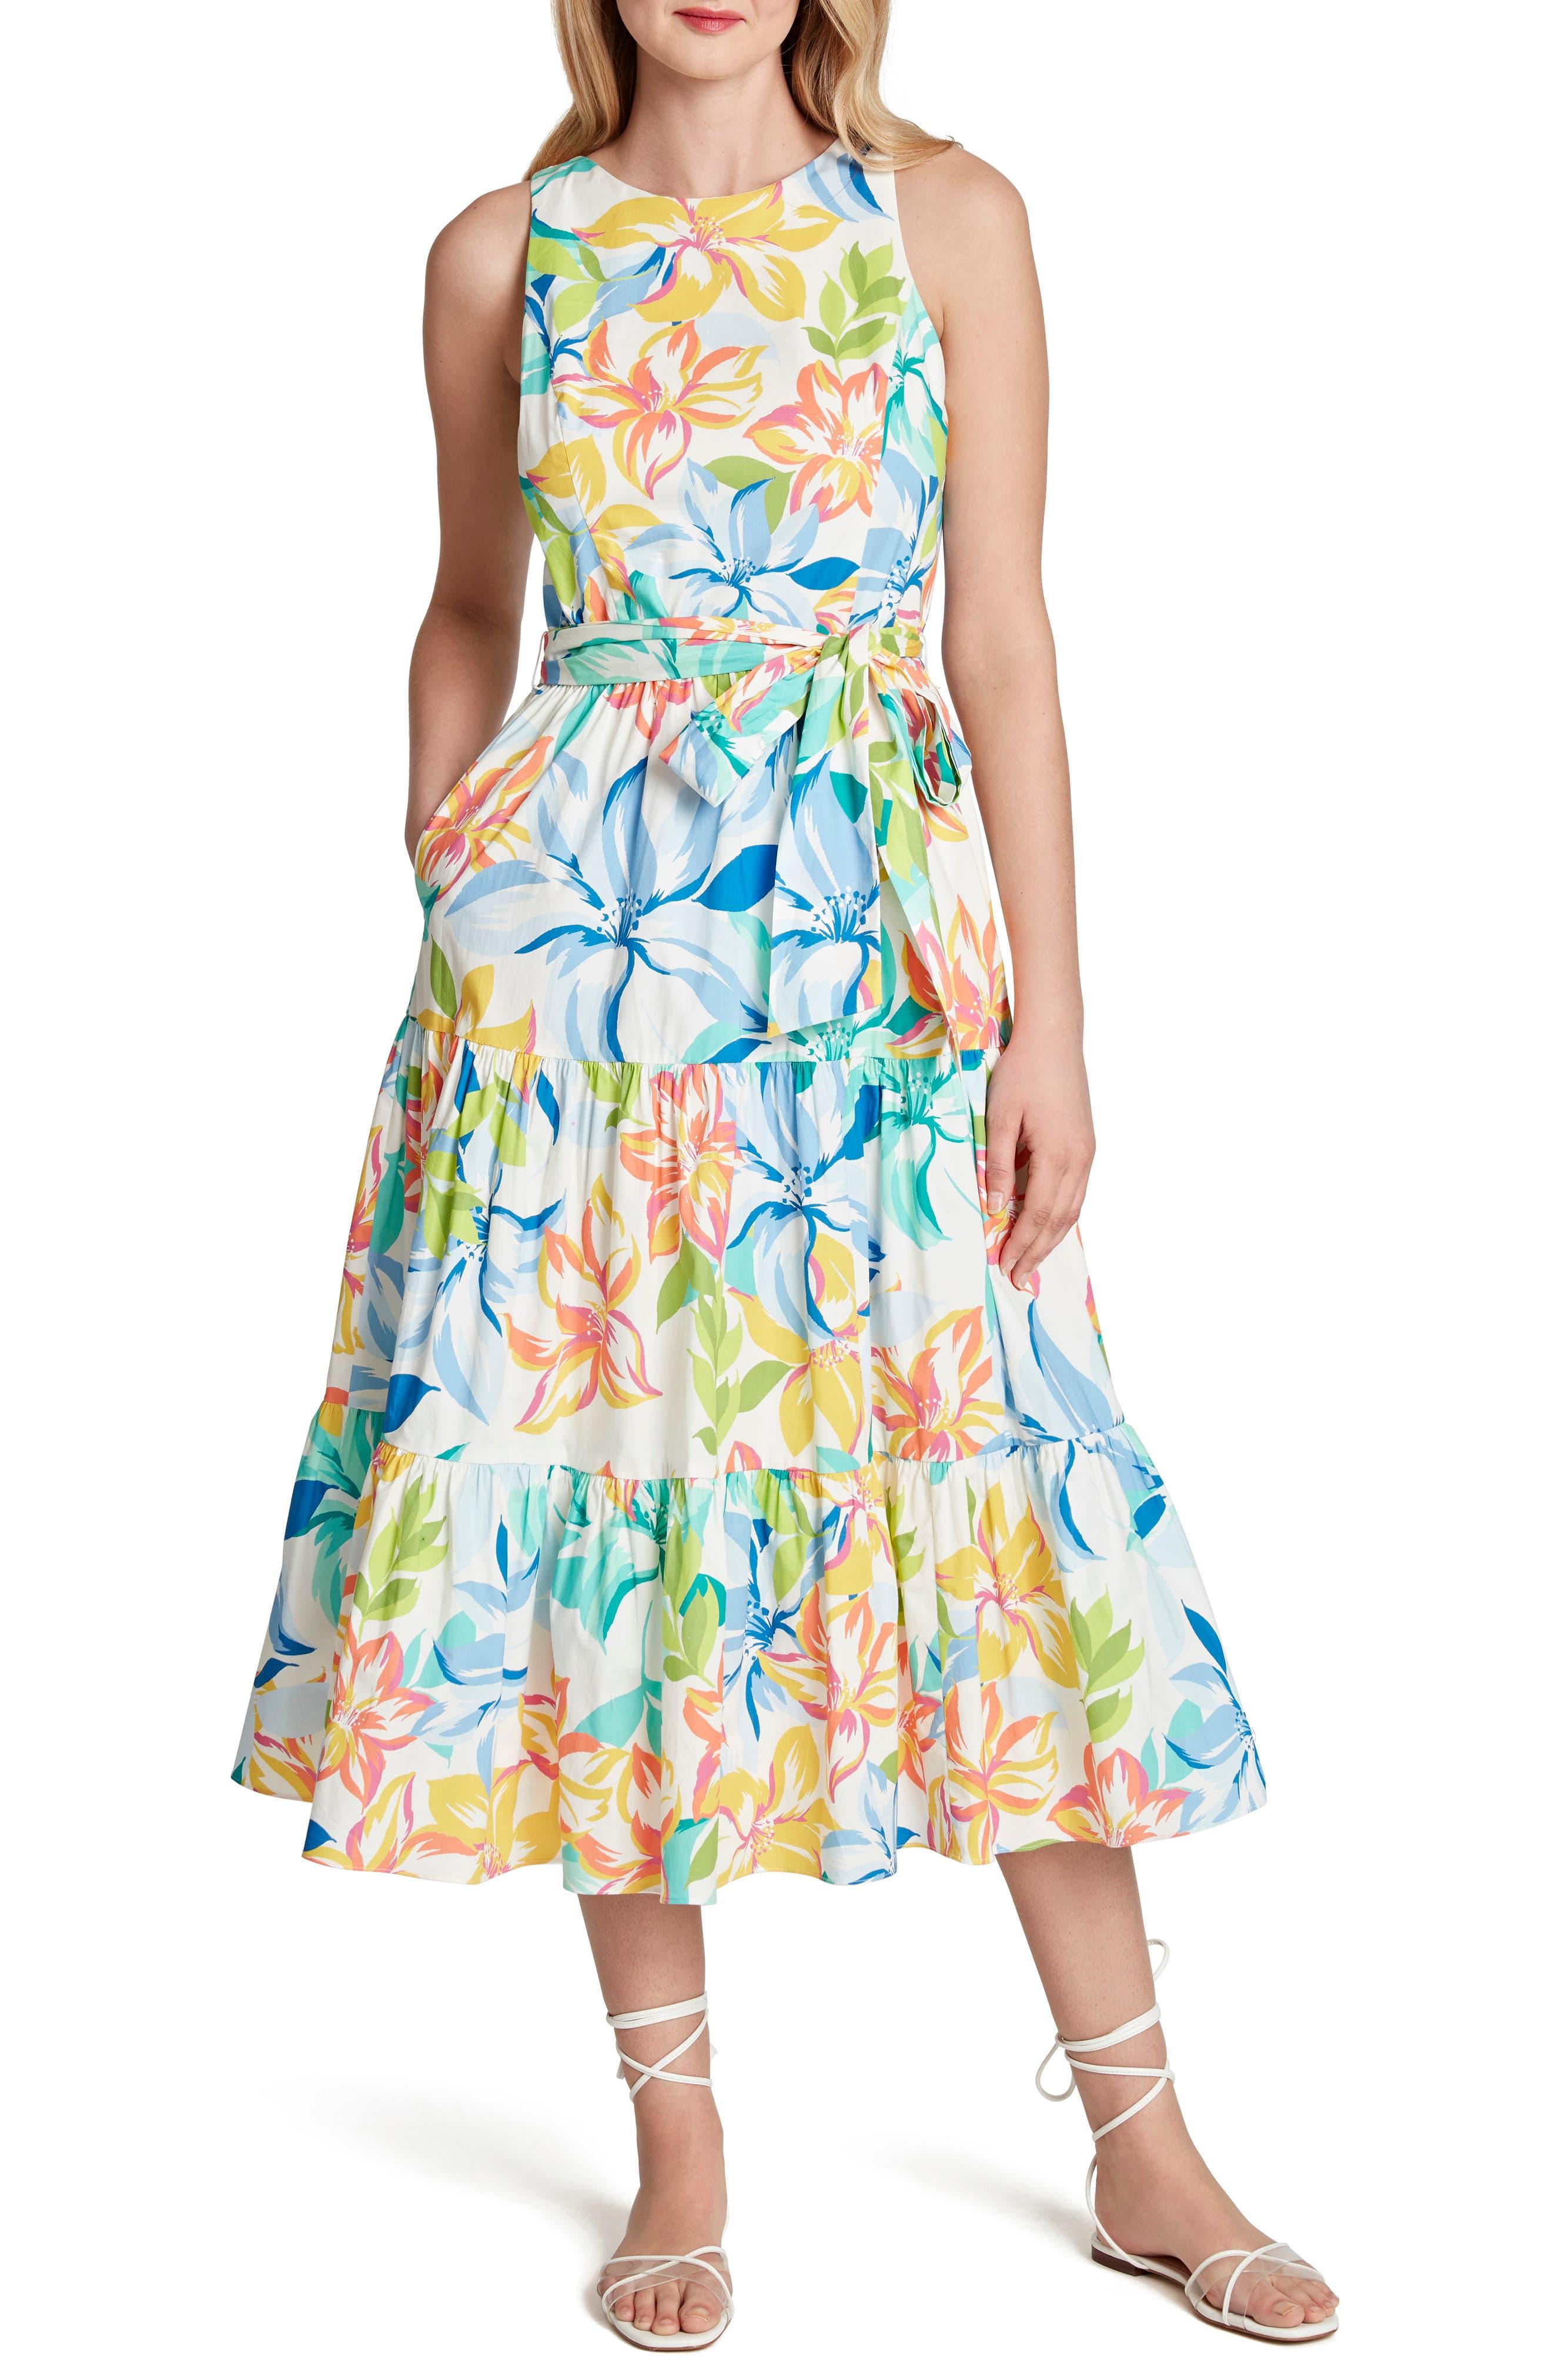 Tahari Womens Novelty Foil Dress Dress